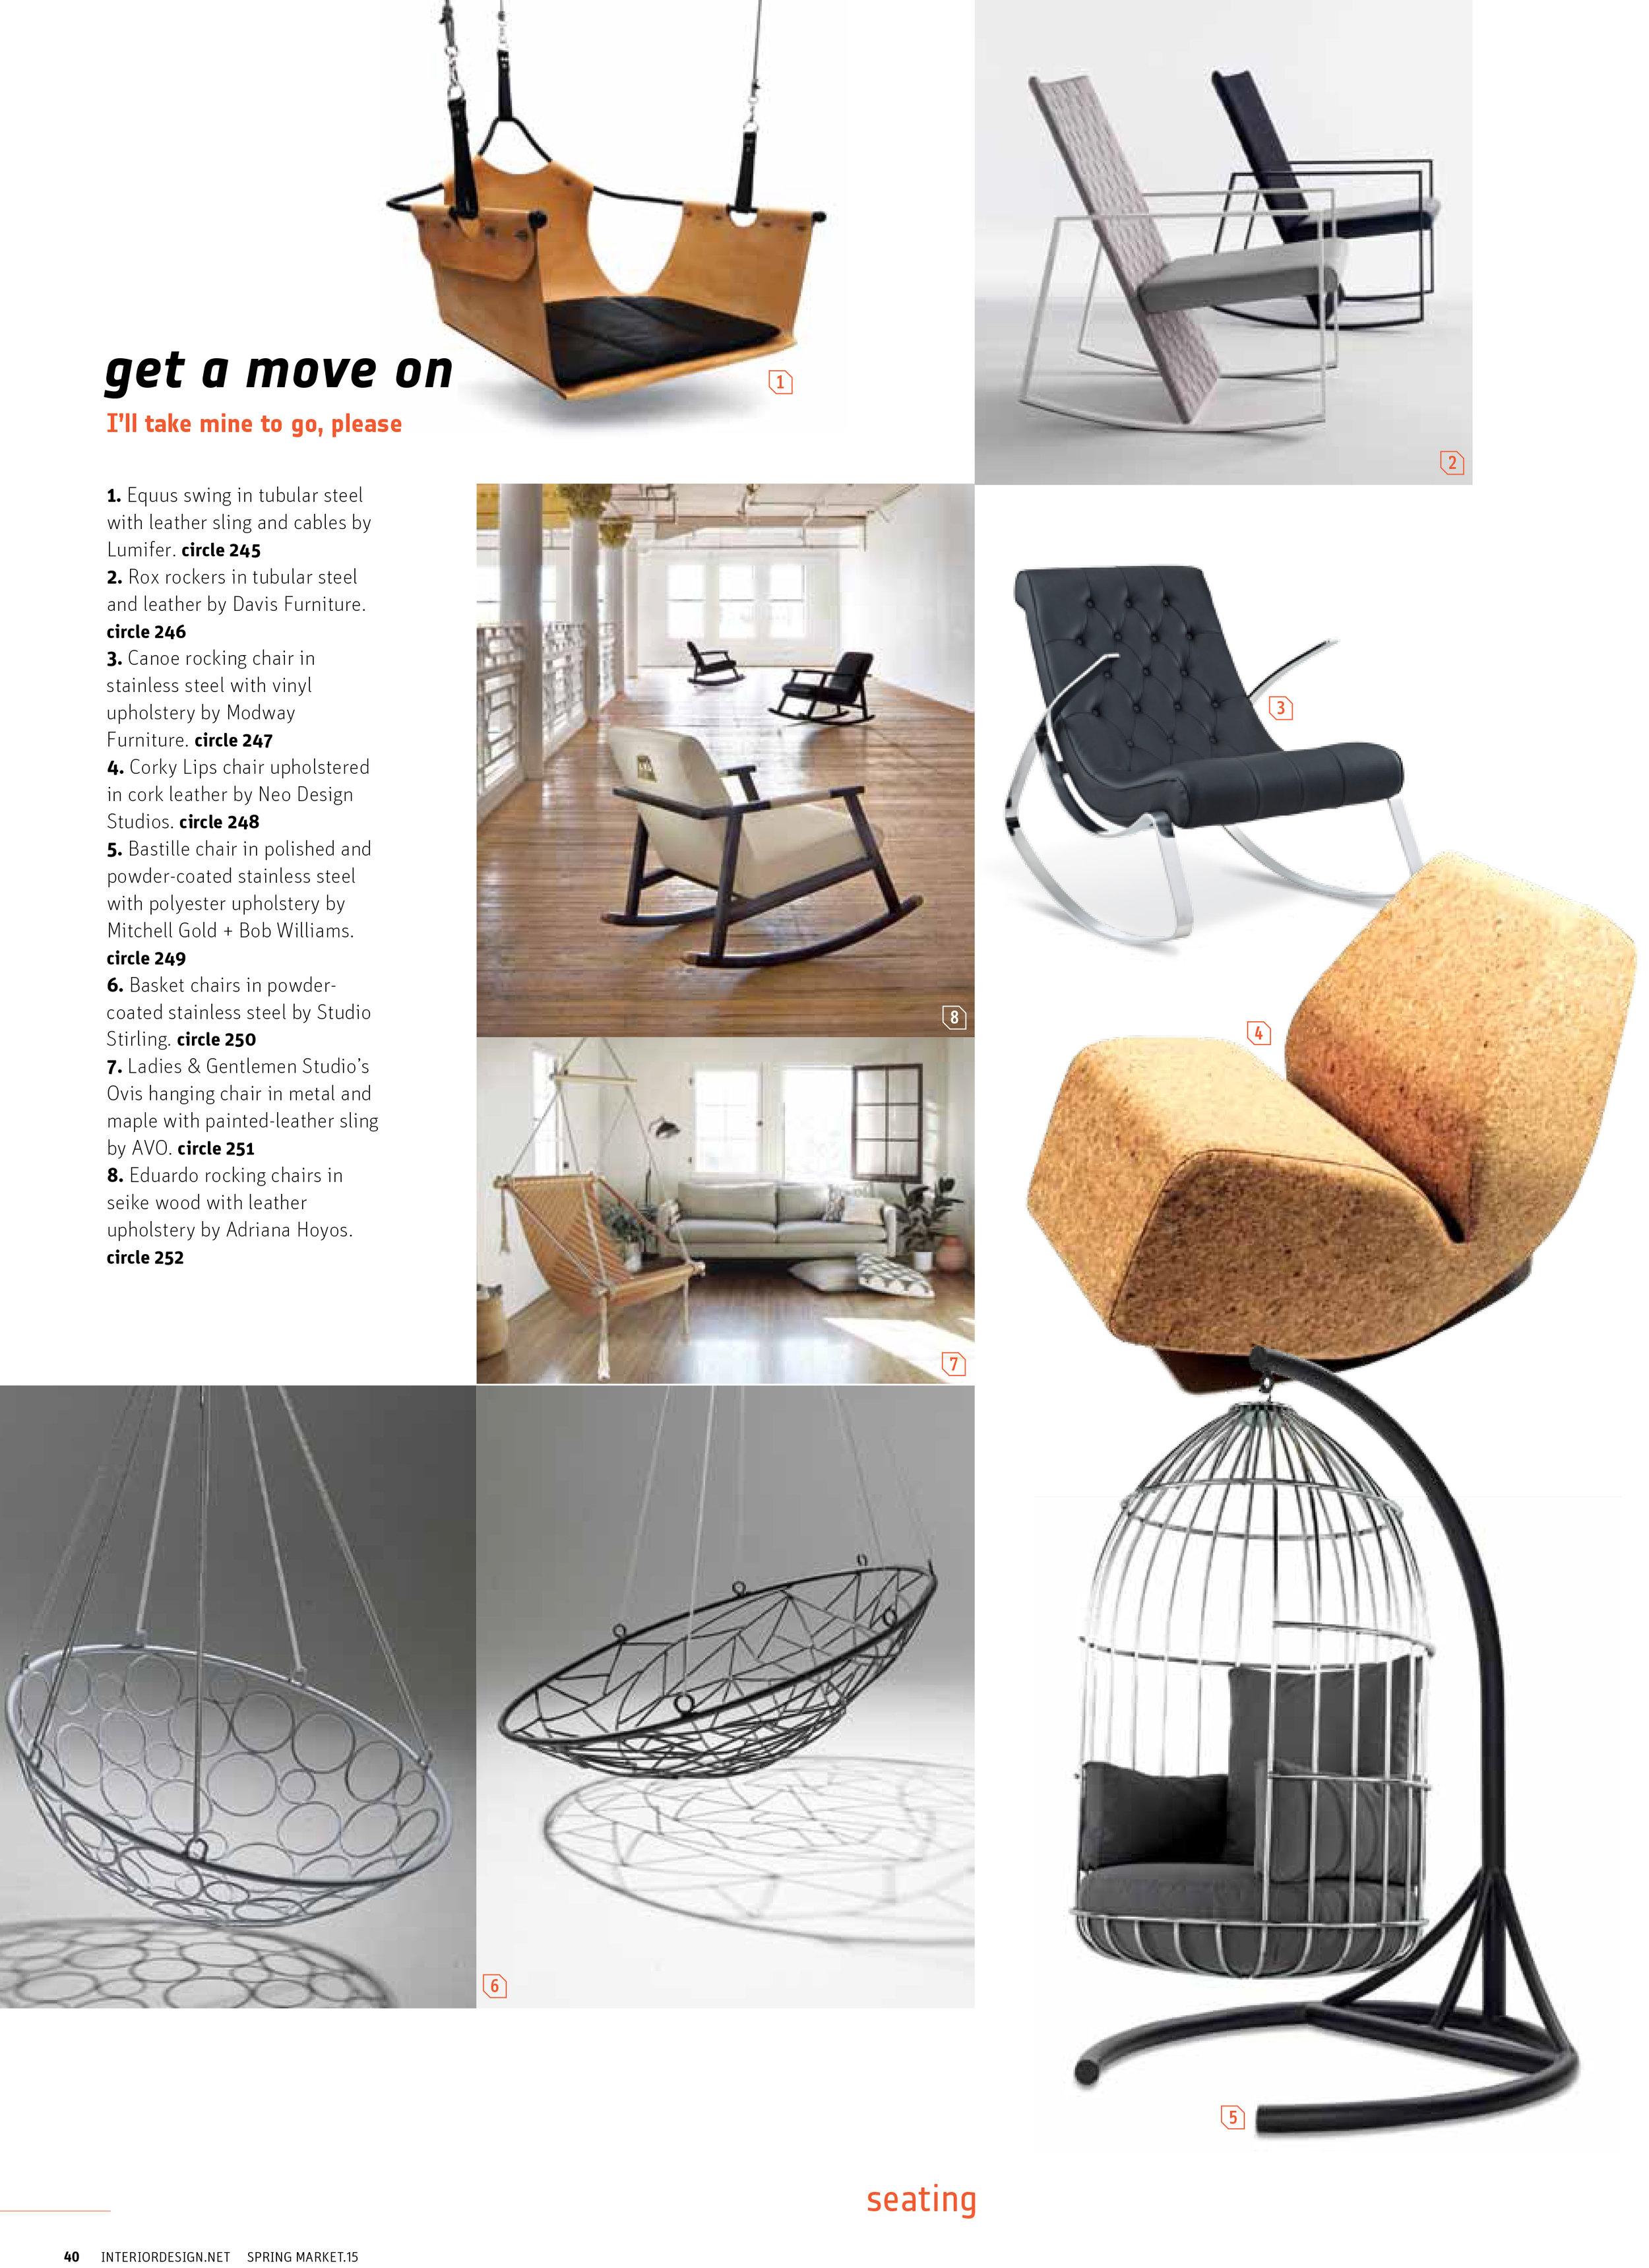 2015_05_InteriorDesign_2.jpg